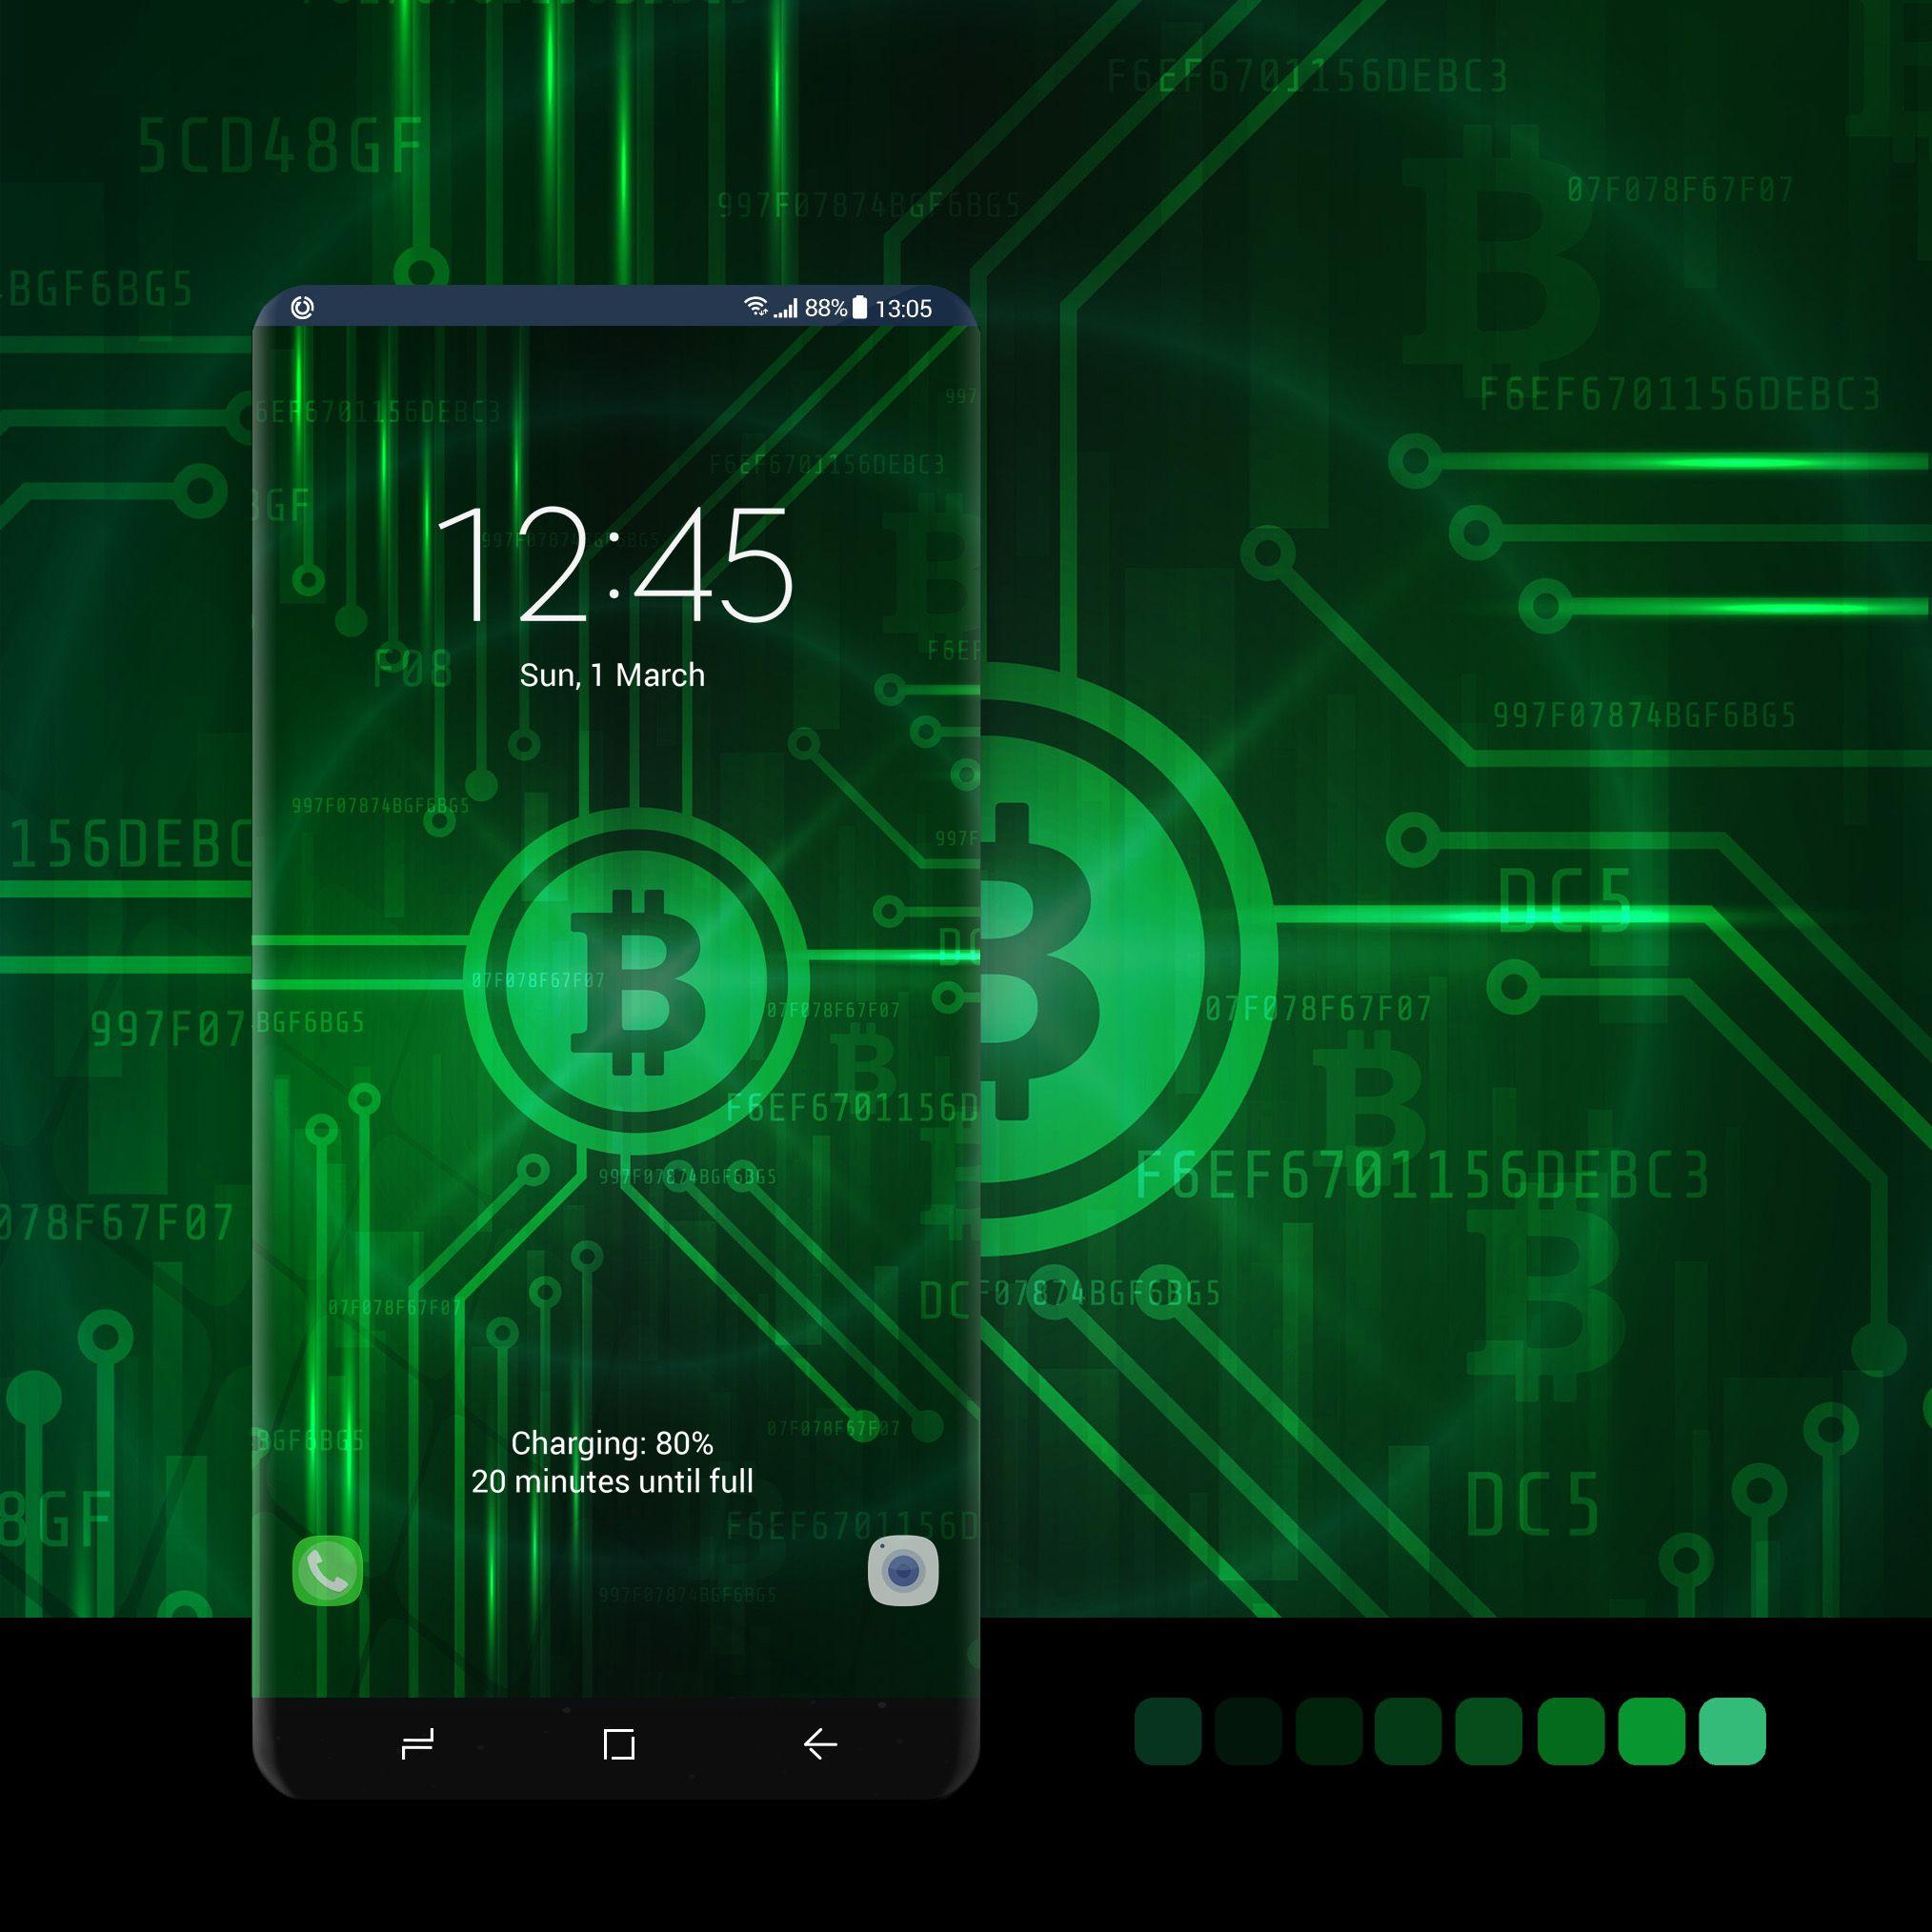 Green bitcoin wallpaper wallpaper, android, phone,